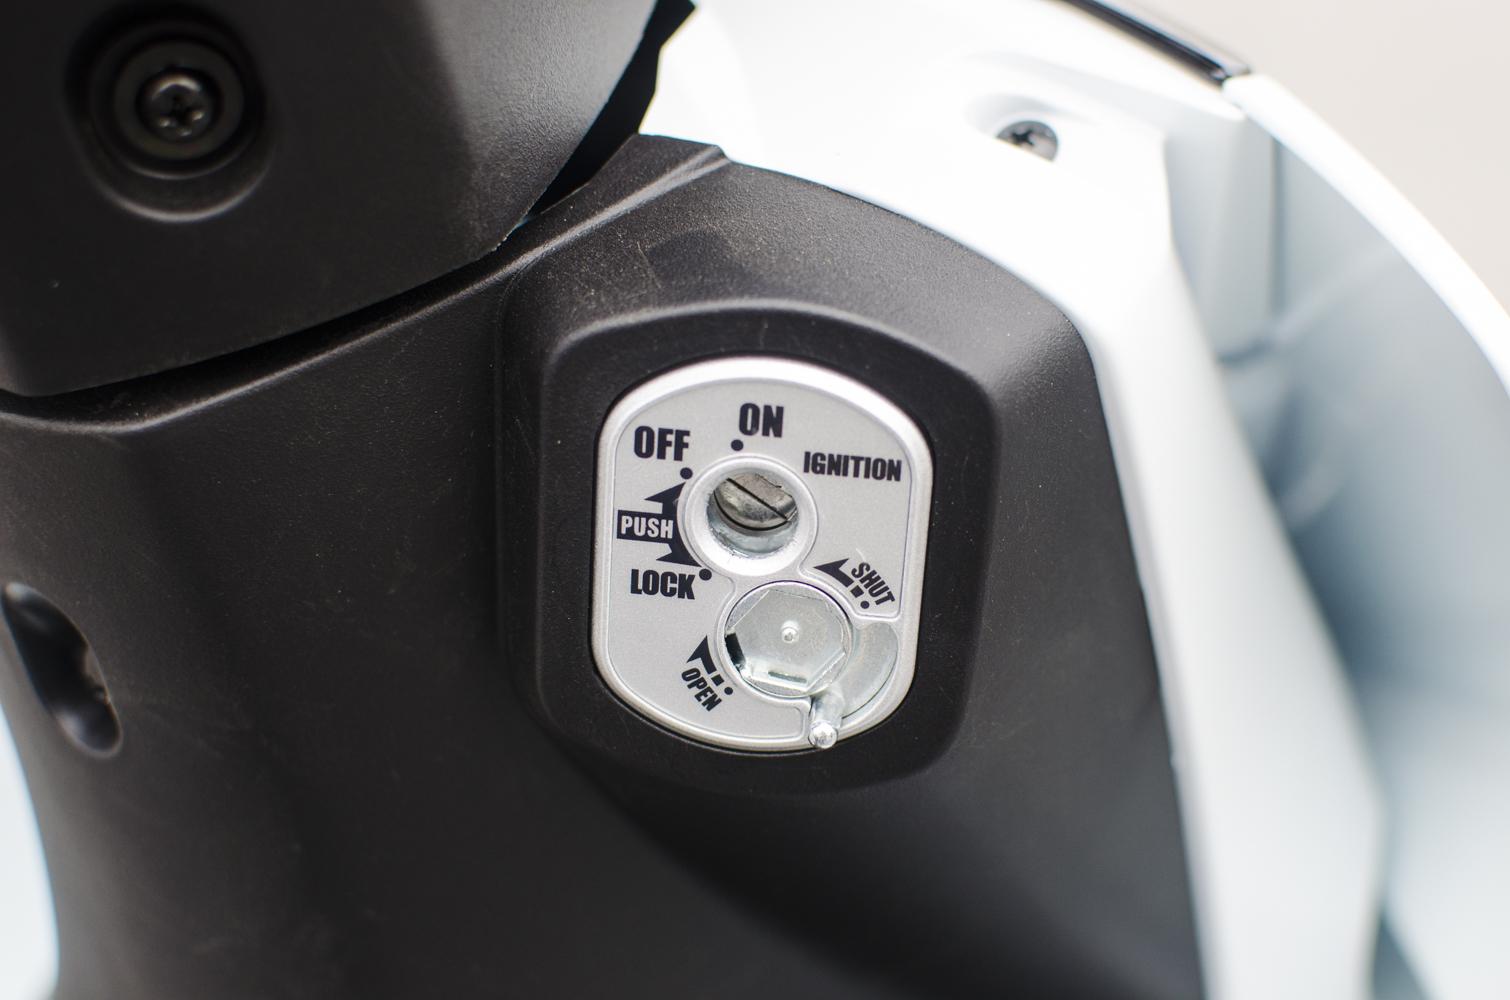 Đánh giá Honda Blade 110 : Vừa đủ cho nhu cầu 10